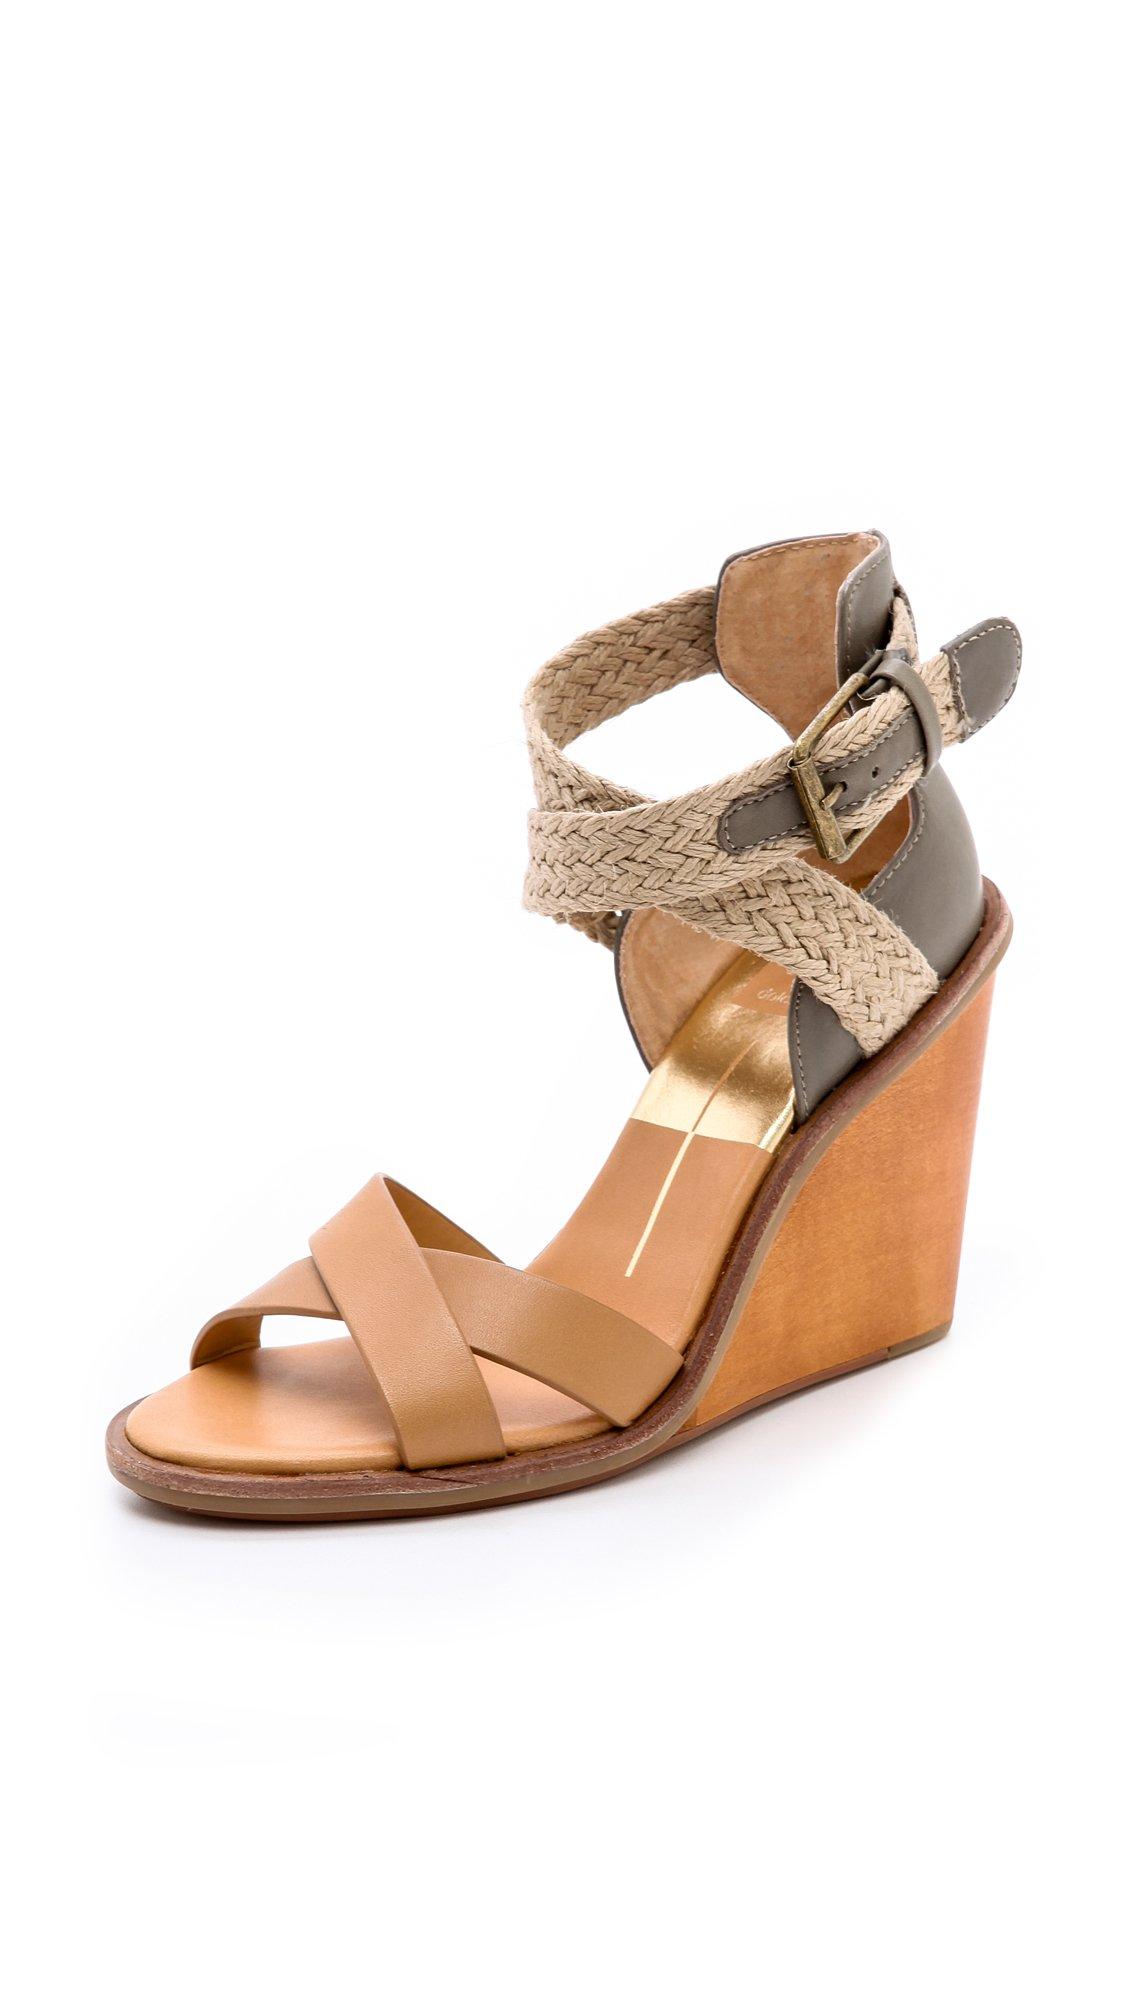 dolce vita jarona wedge sandals in brown caramel lyst